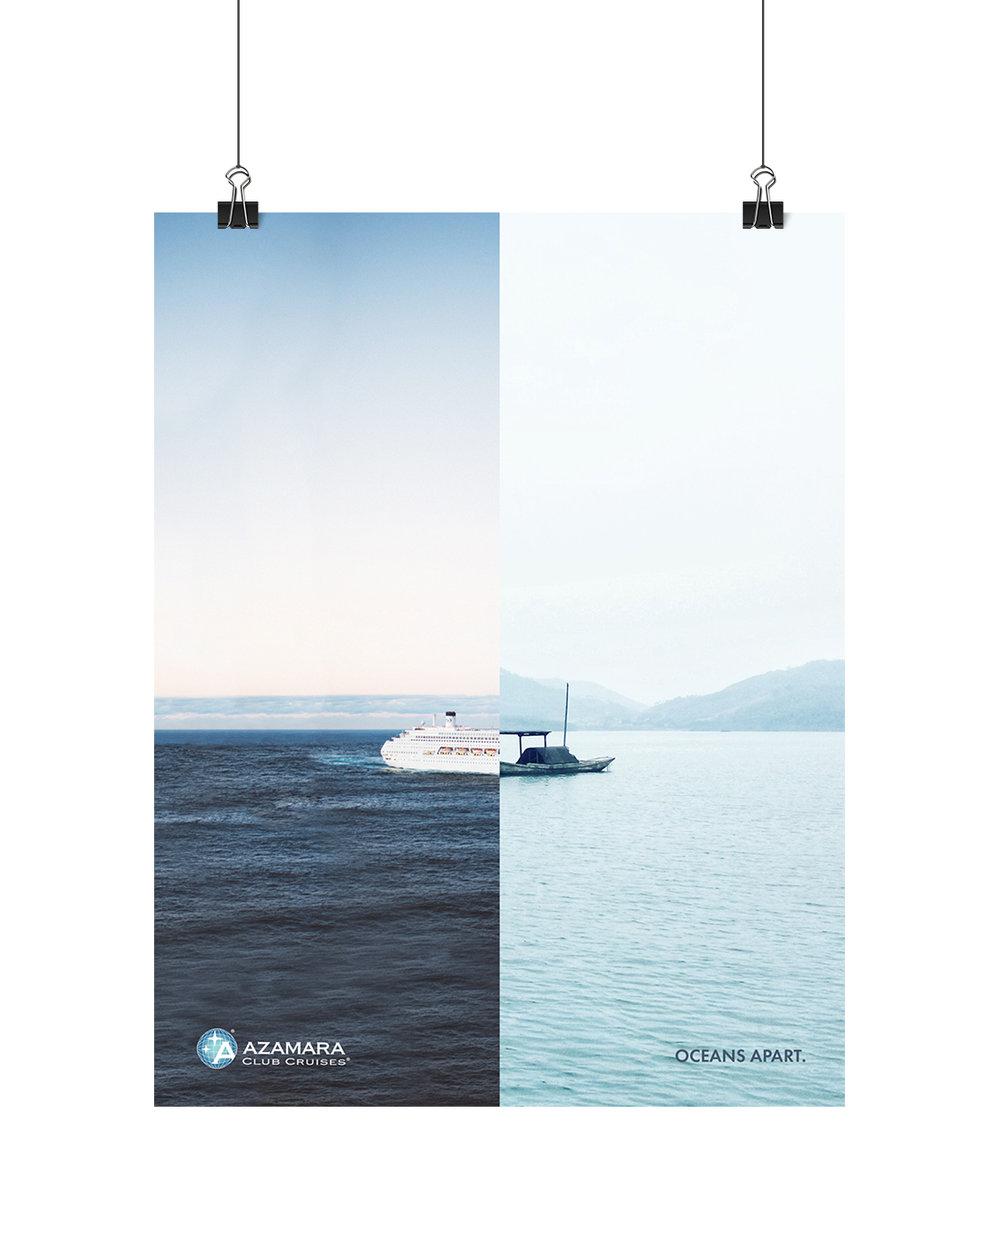 Poster_azamara.jpg